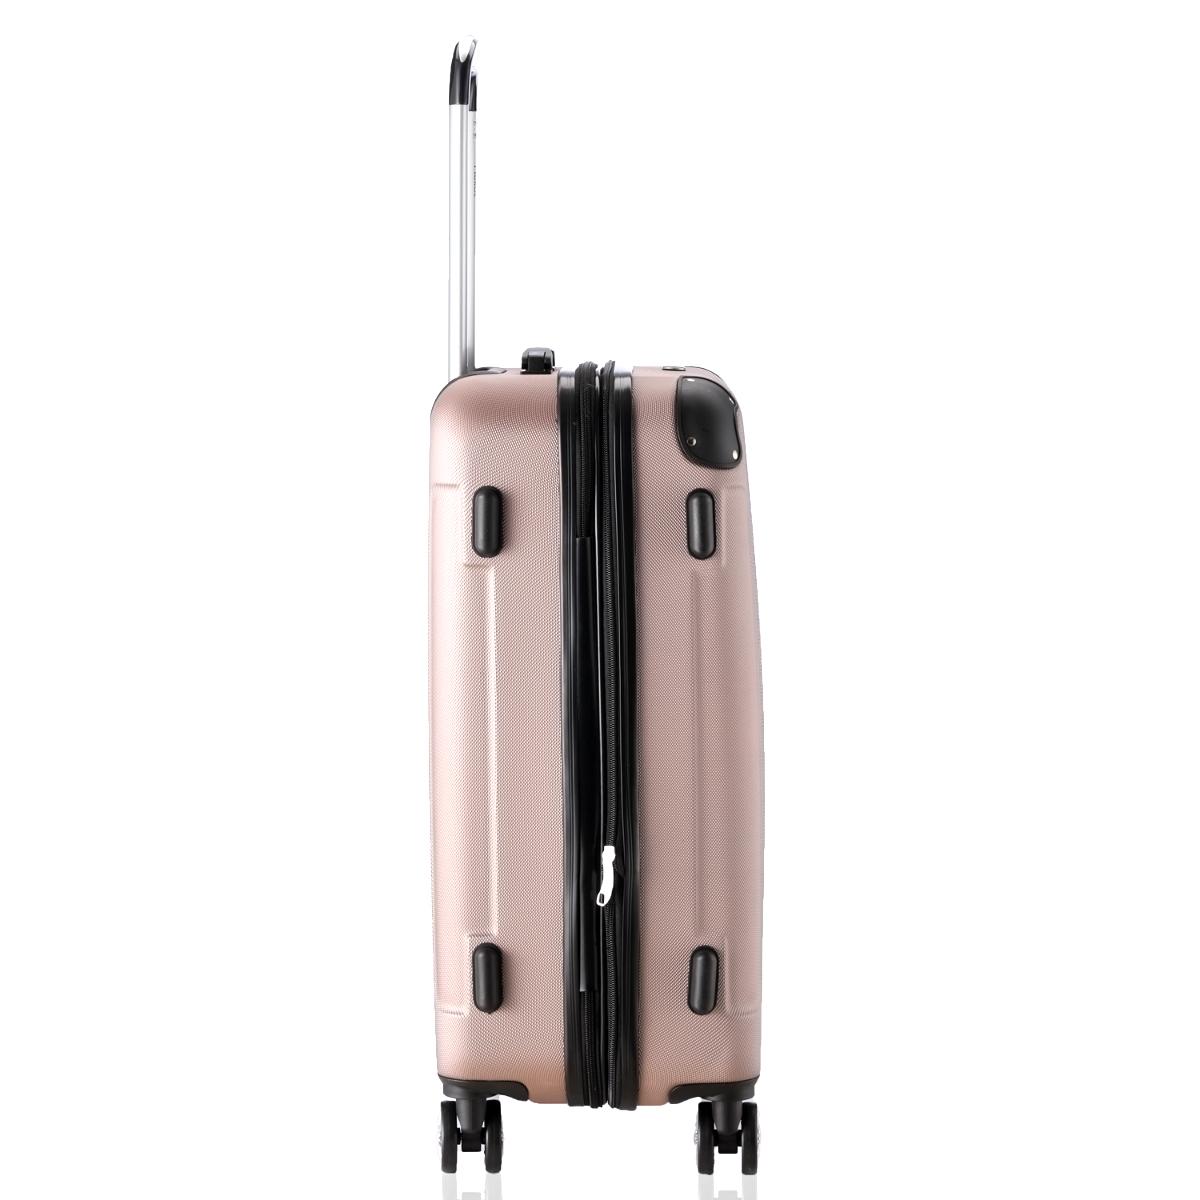 Koffer-Flexot-2045-Hartschalenkoffer-Trolley-Kofferset-Reisekoffer-M-L-XL-Set Indexbild 97